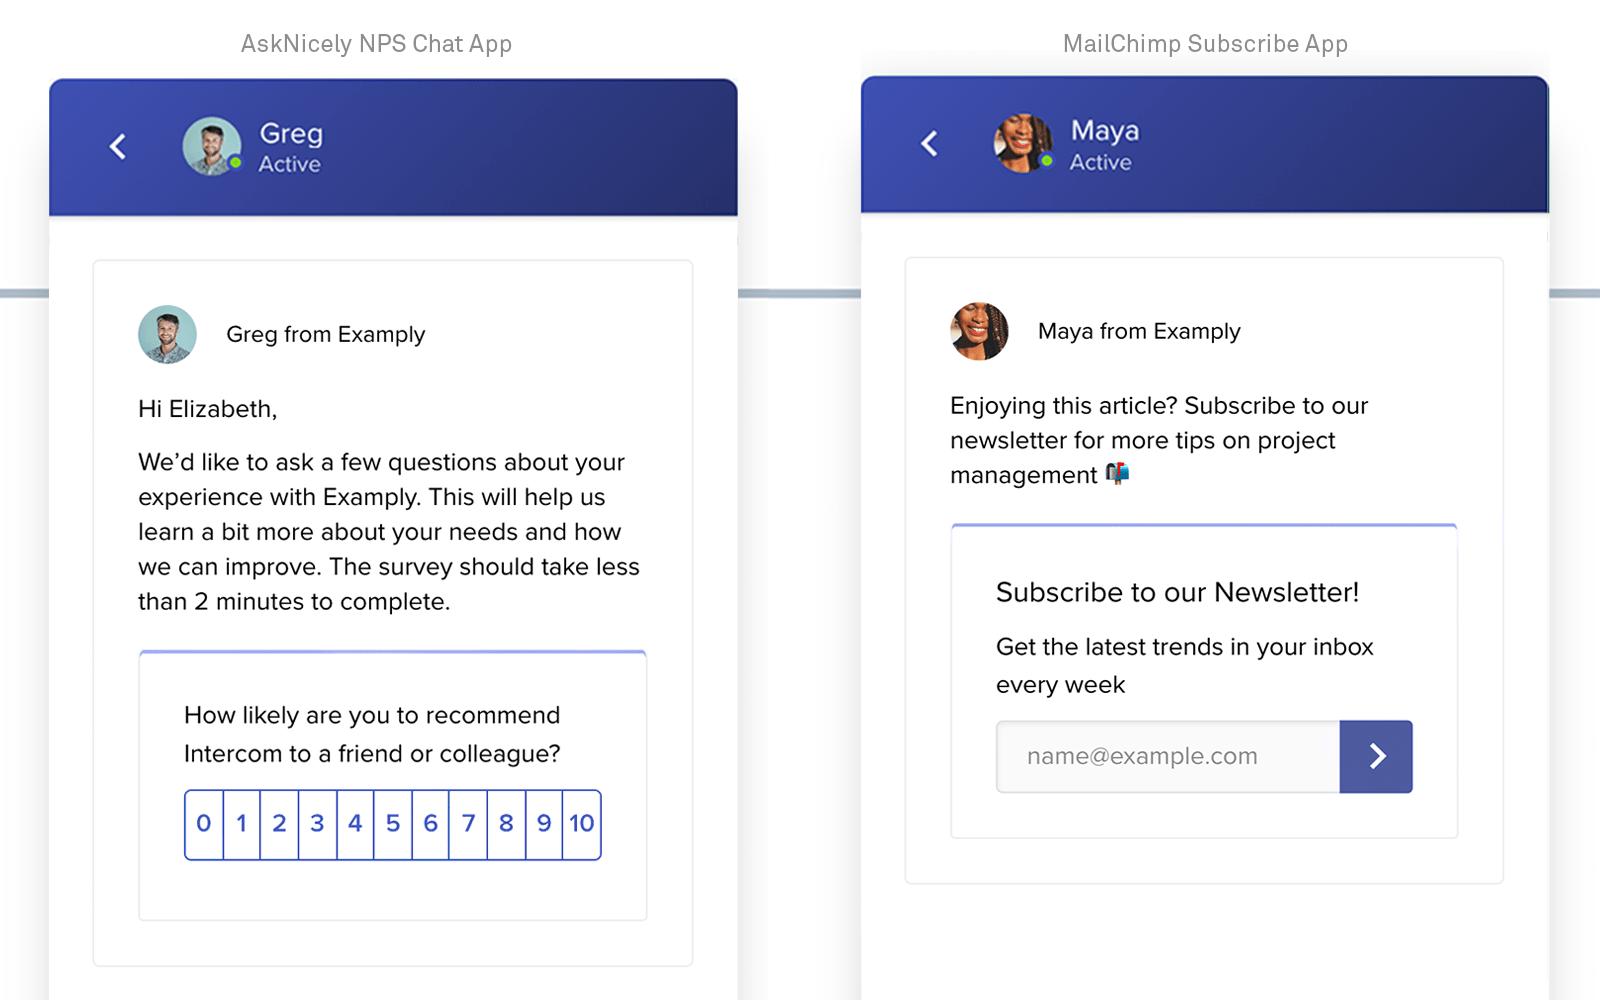 AskNicely MailChimp Intercom Apps